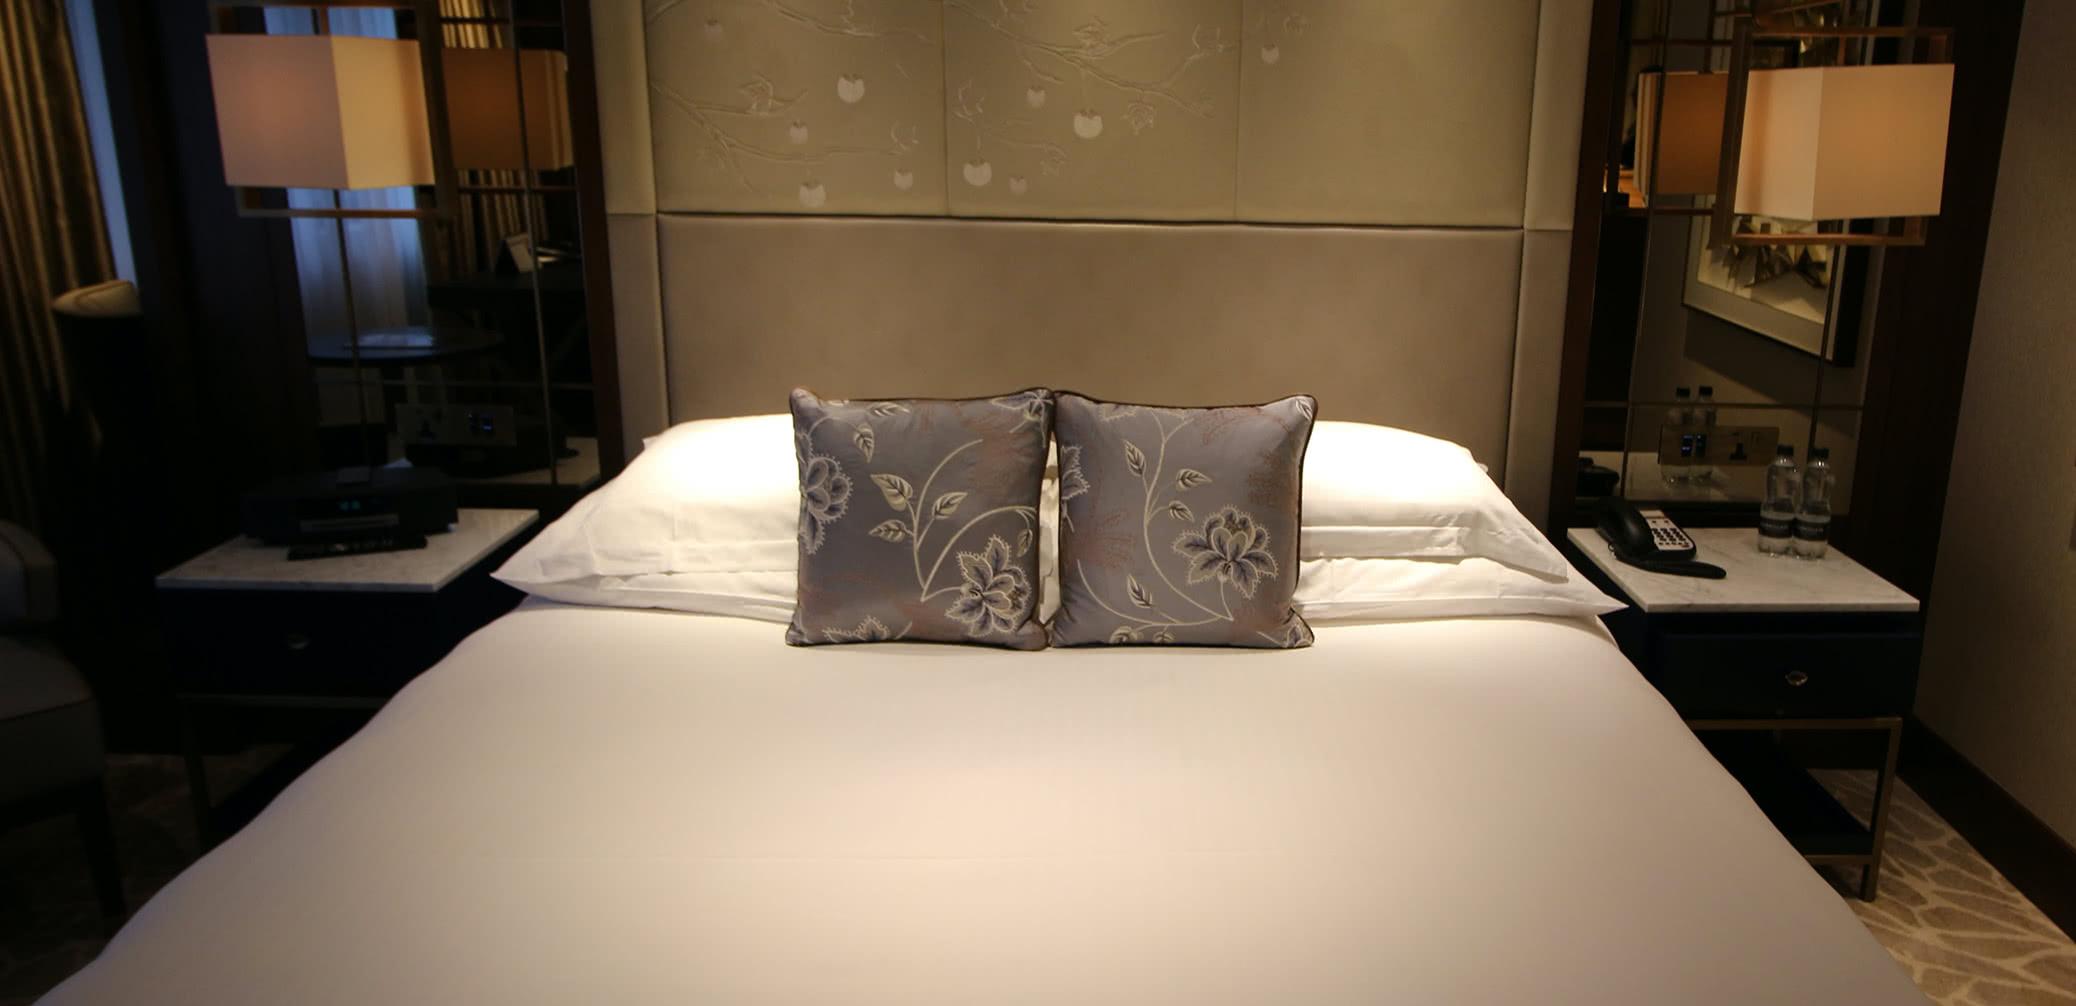 Marriott Vs Sheraton Vs Hilton Vs Hyatt At Niagara Falls: Which Is Best? –  Accommodation – Tips – Luxury Travel Diary